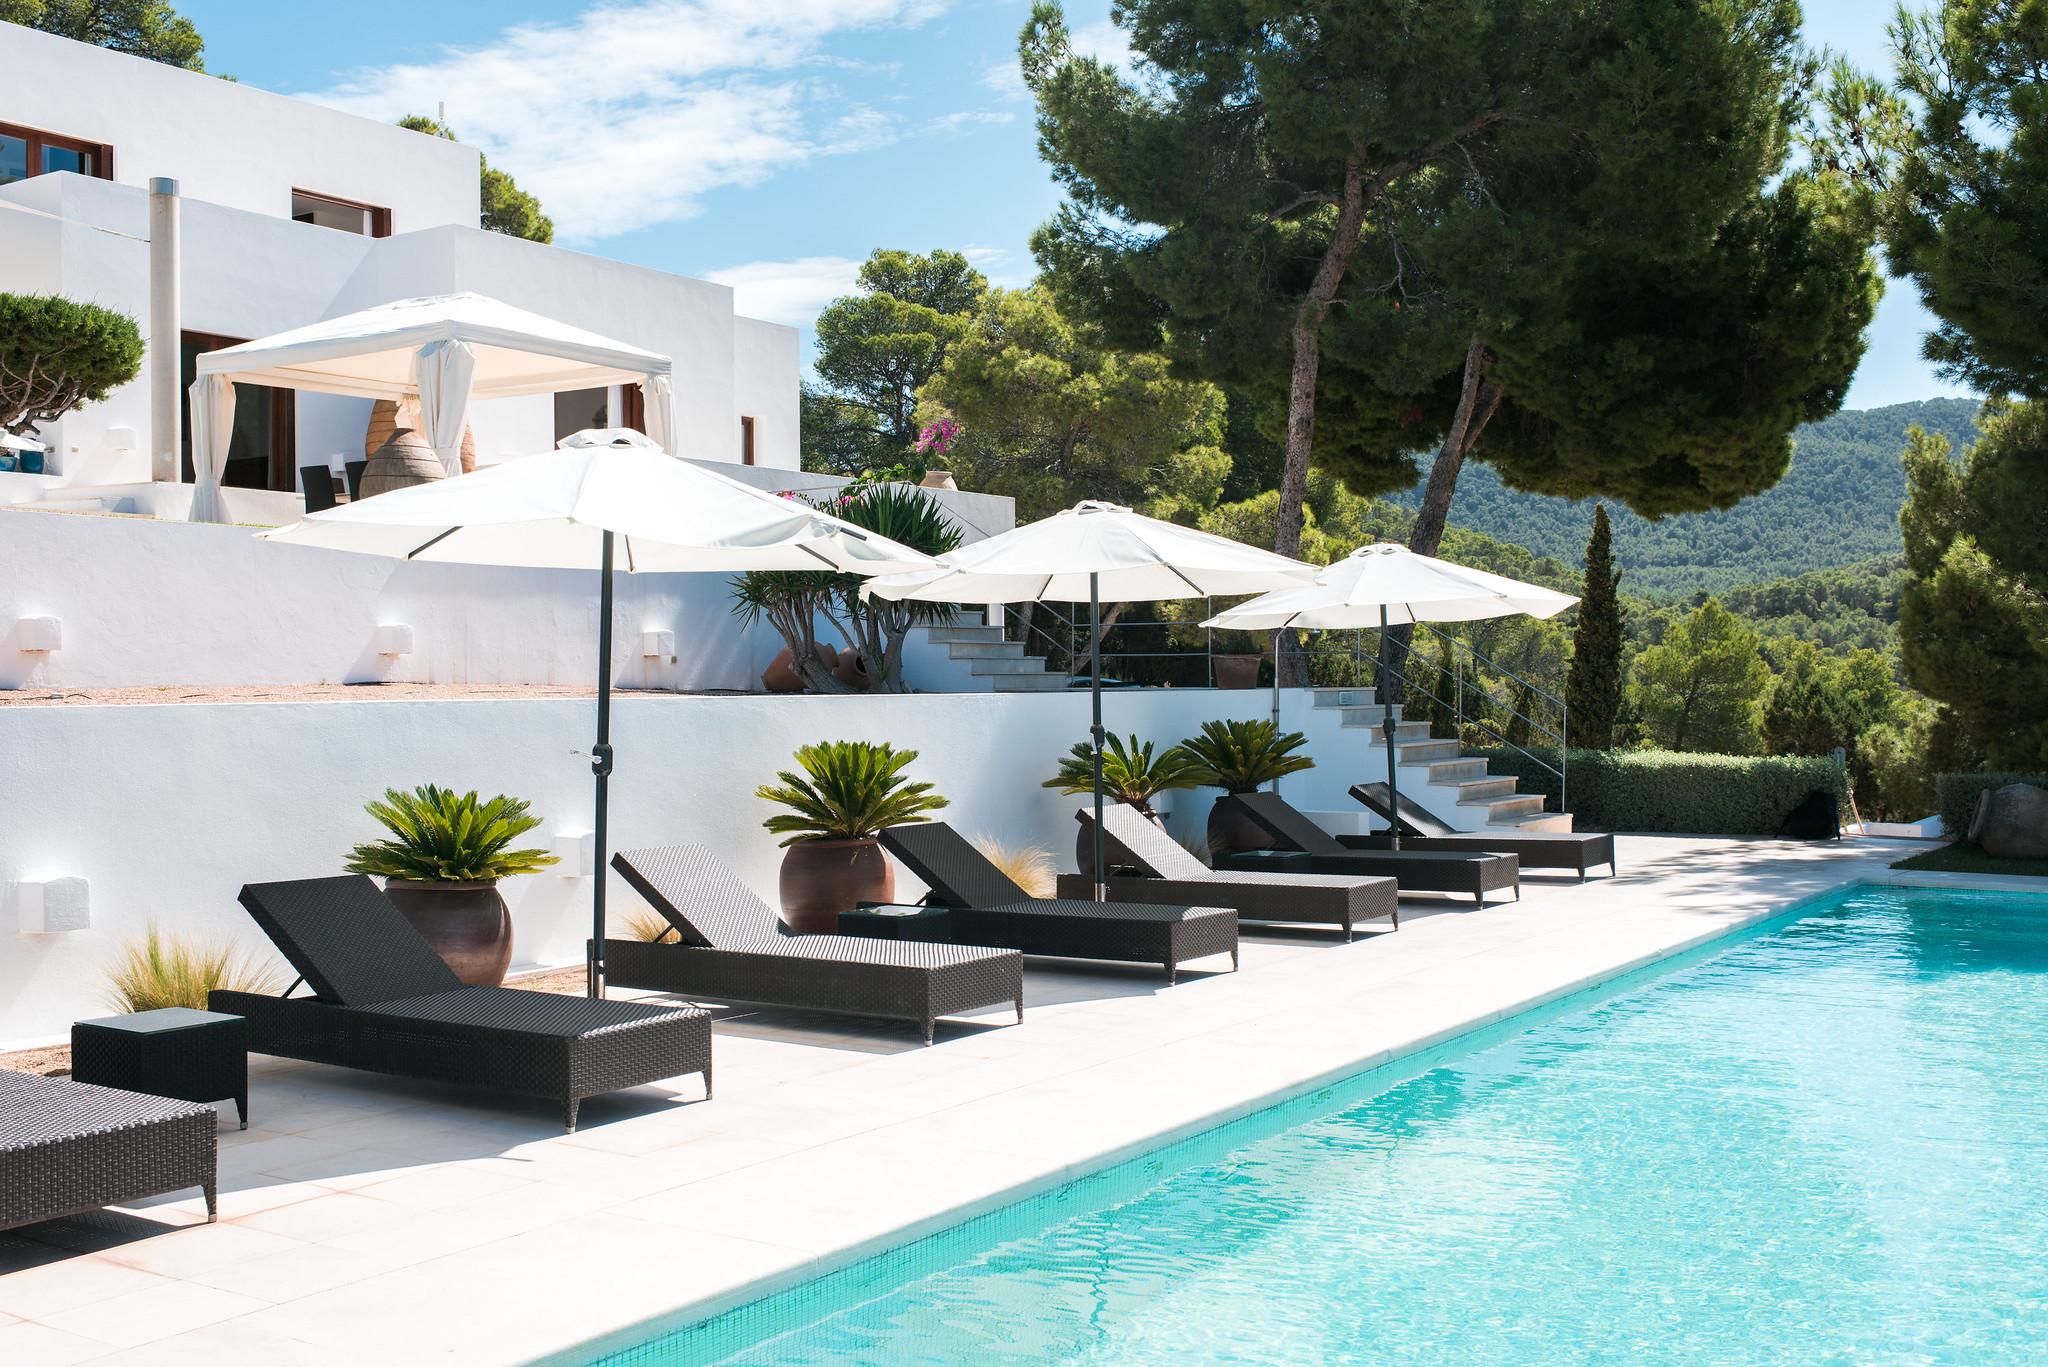 https://www.white-ibiza.com/wp-content/uploads/2020/05/white-ibiza-villas-can-ava-sun-loungers.jpg